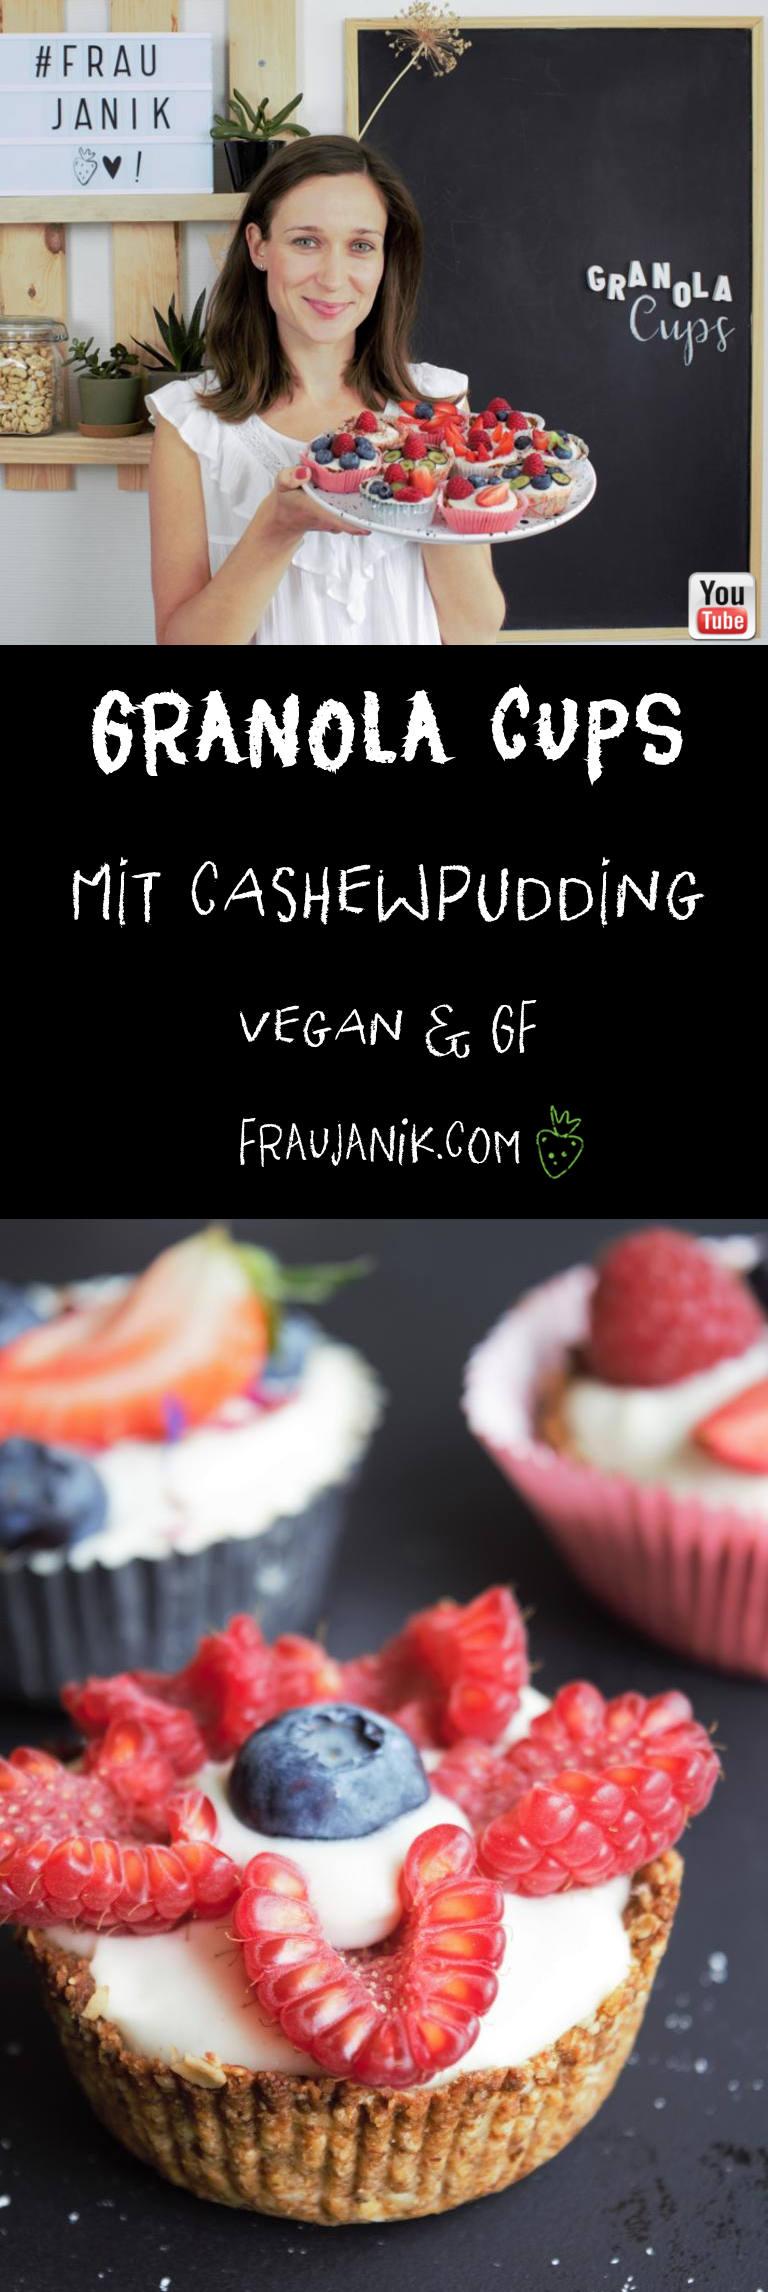 Granola Cups,vegan mit Cashewpudding